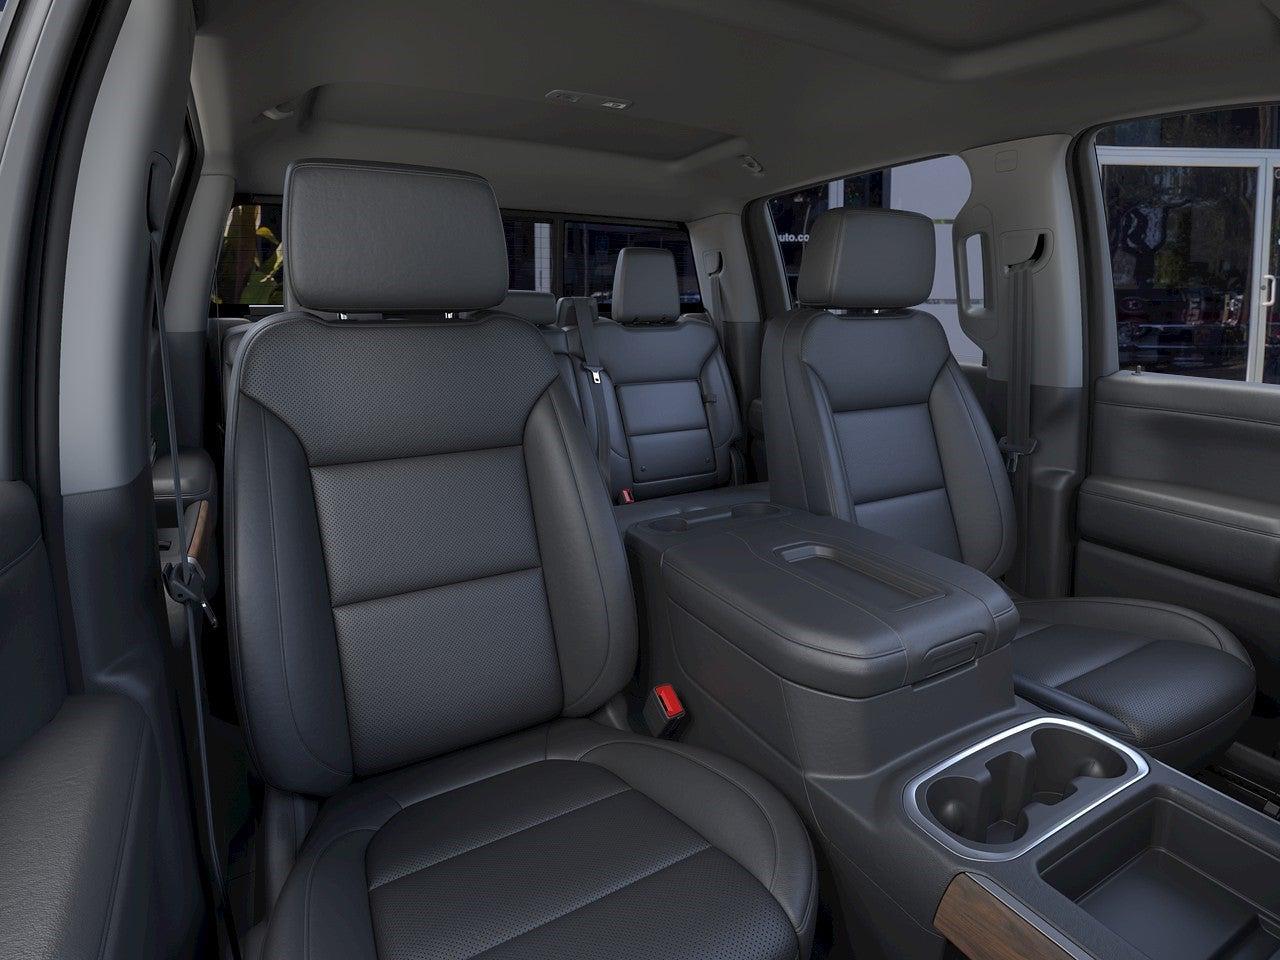 2021 GMC Sierra 1500 Crew Cab 4x4, Pickup #T21432 - photo 14